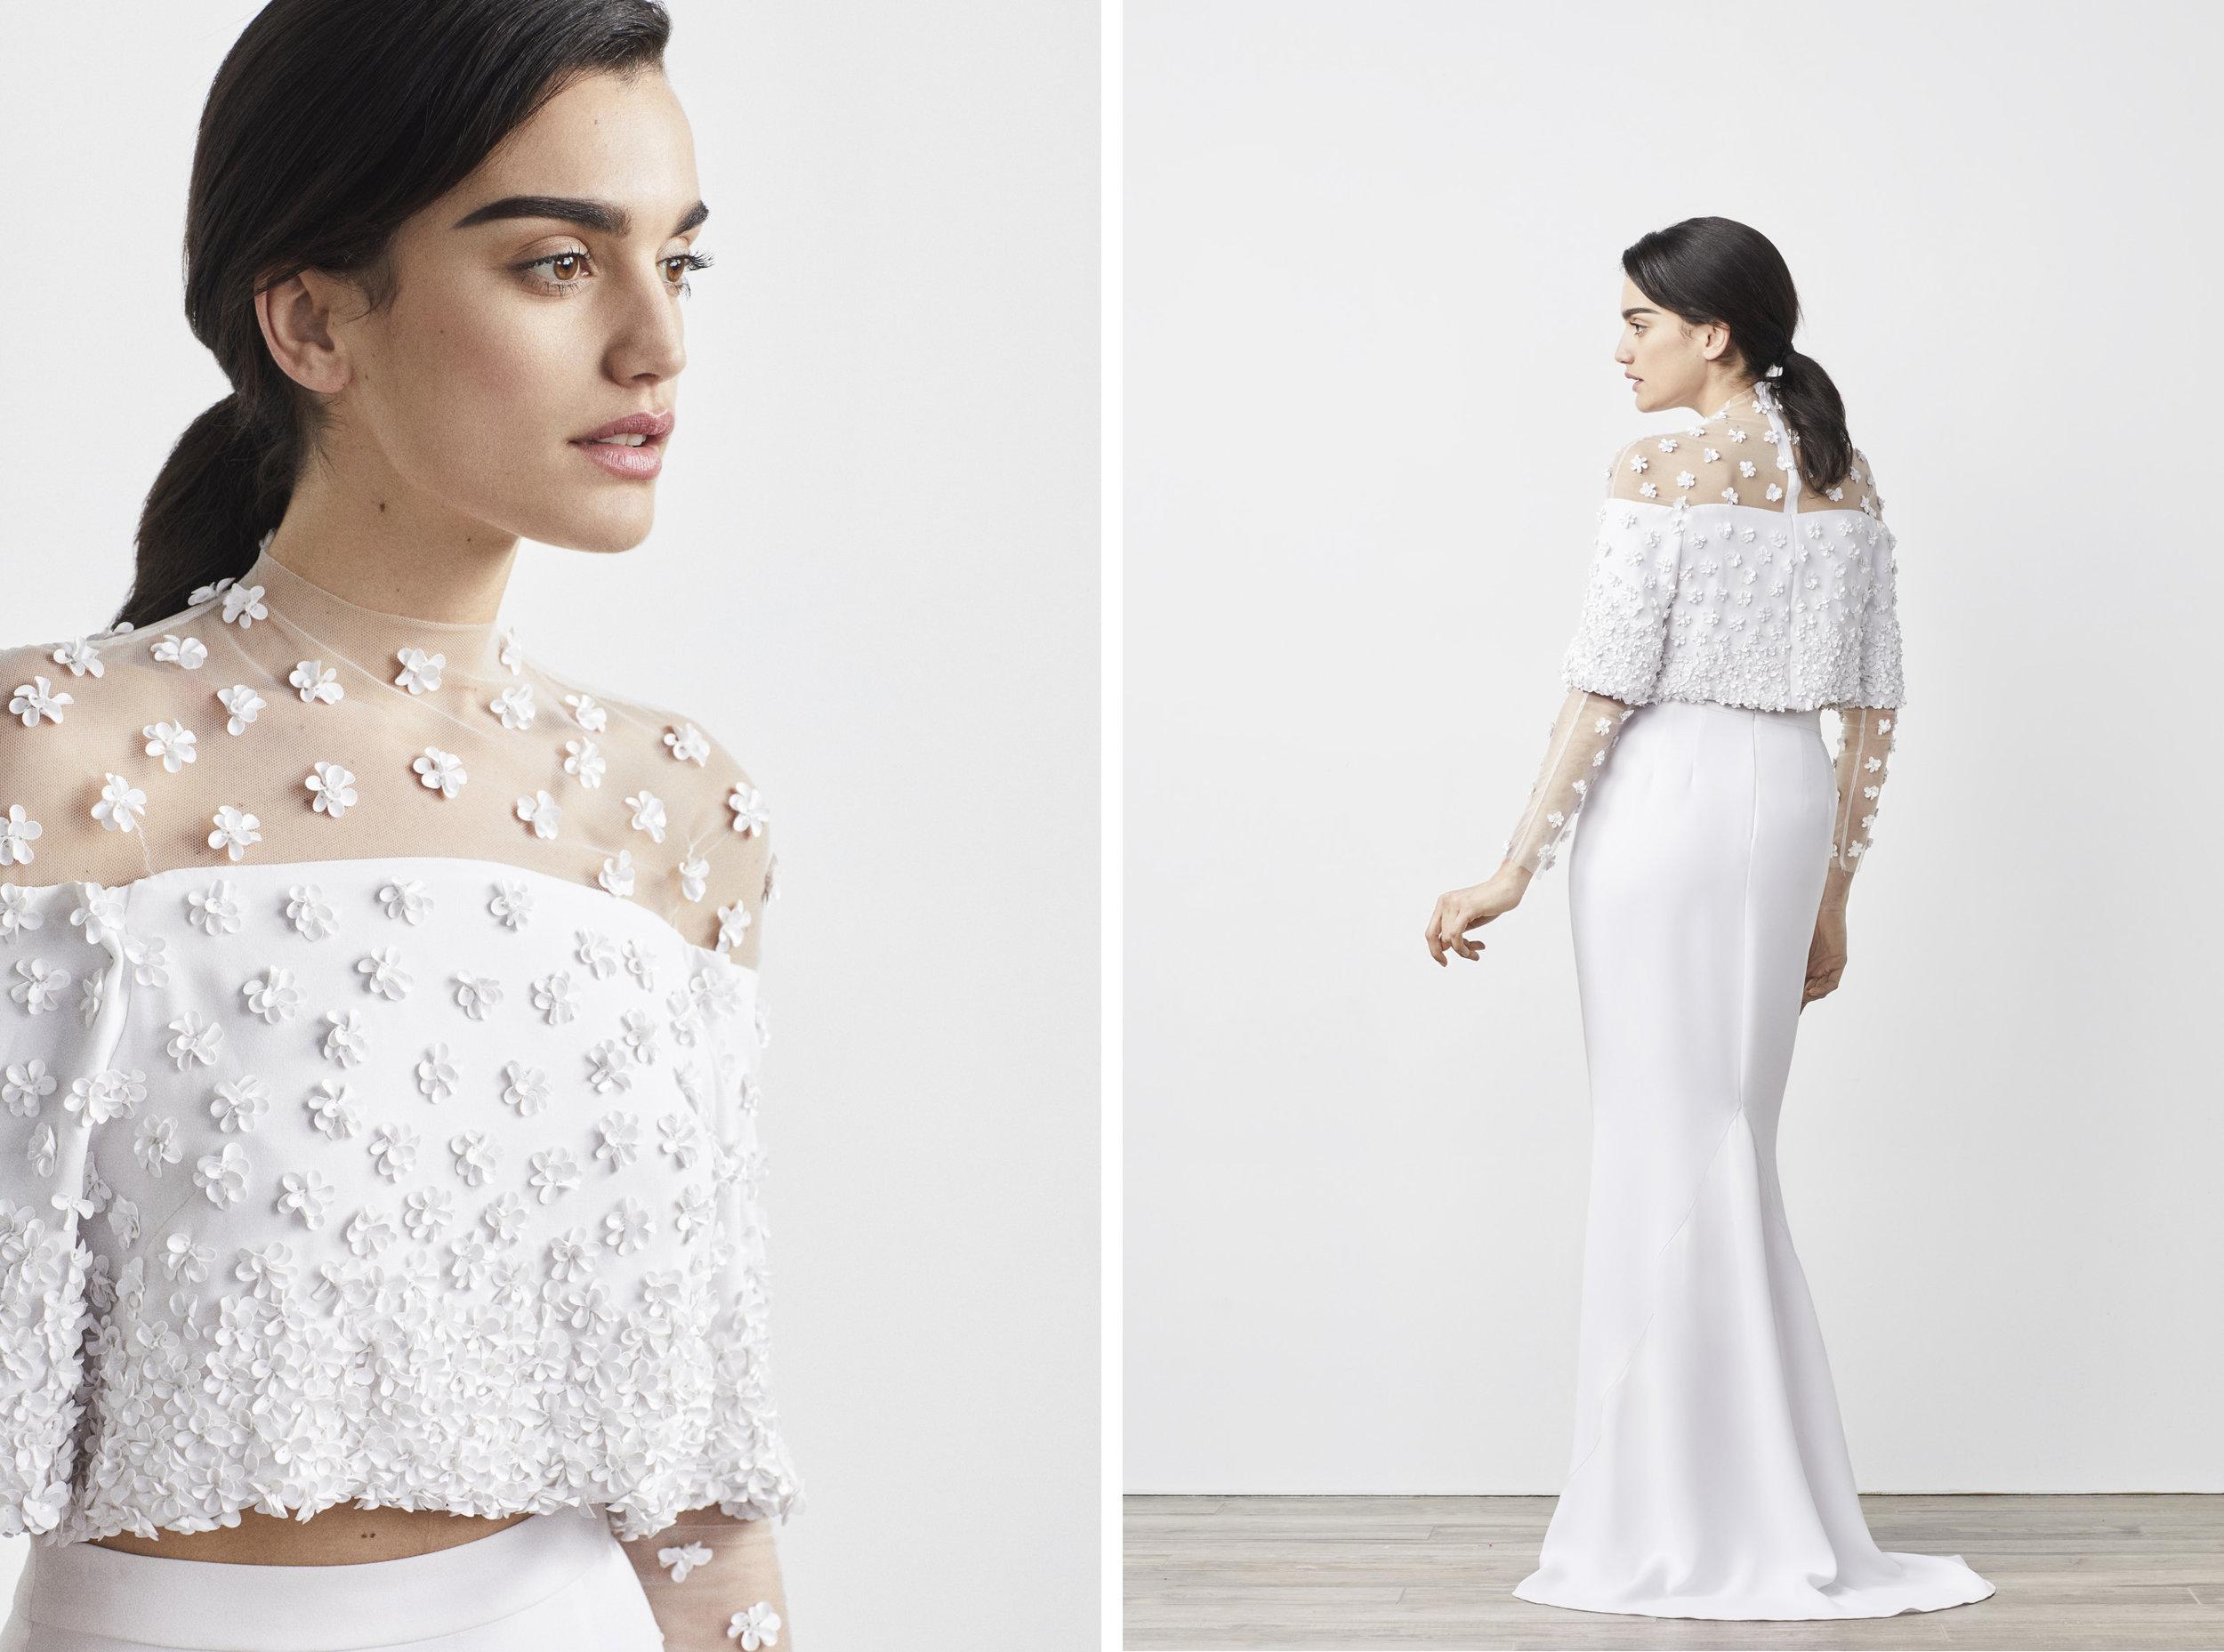 Adelaide-and-Celine-Blossom-Wedding-Dress-Double.jpg